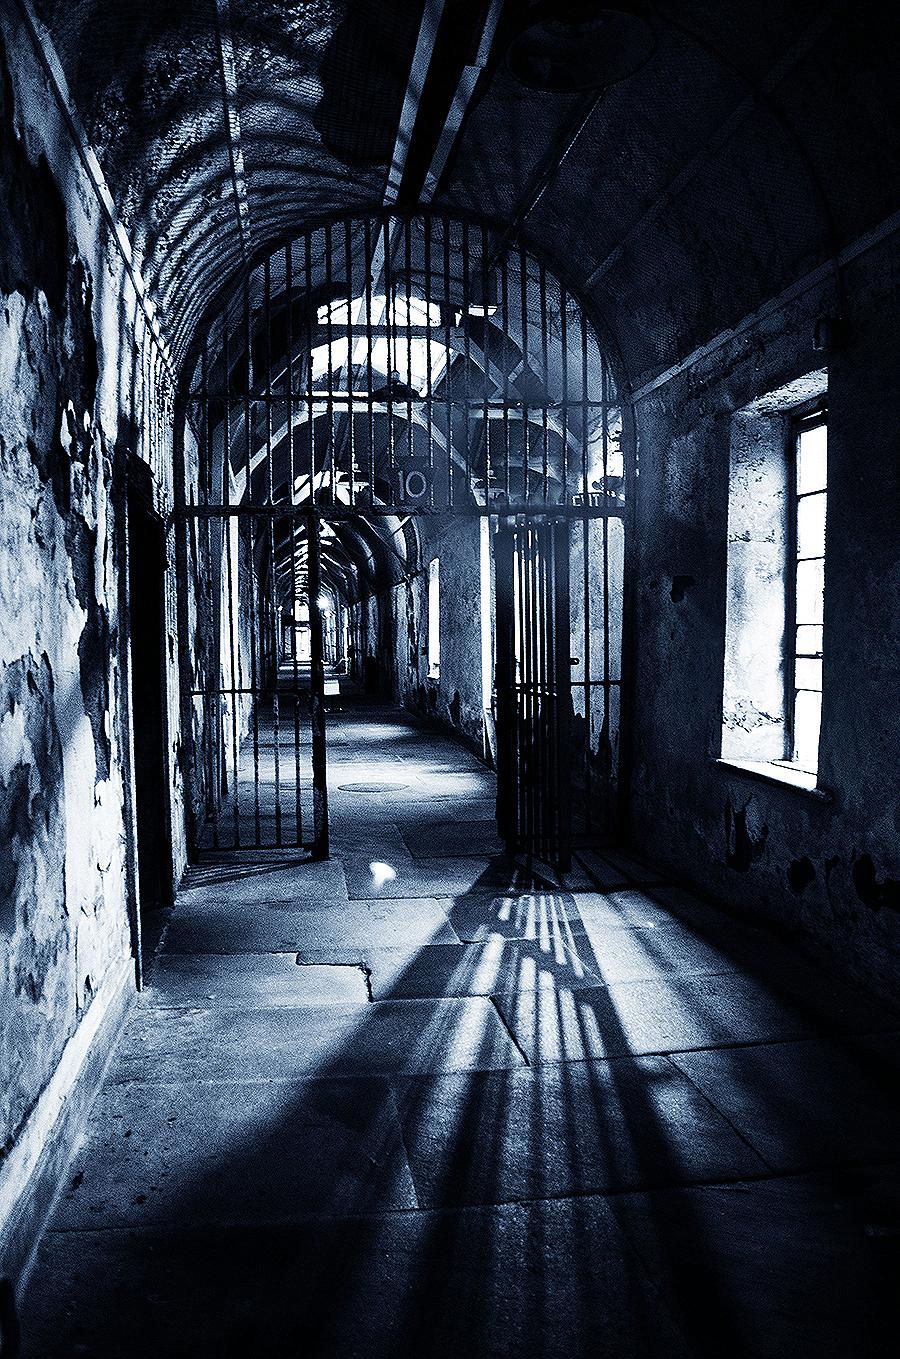 Julie_Chu_Cheong_UPenn_photography_Neo_noir_philadelphia_old_prison